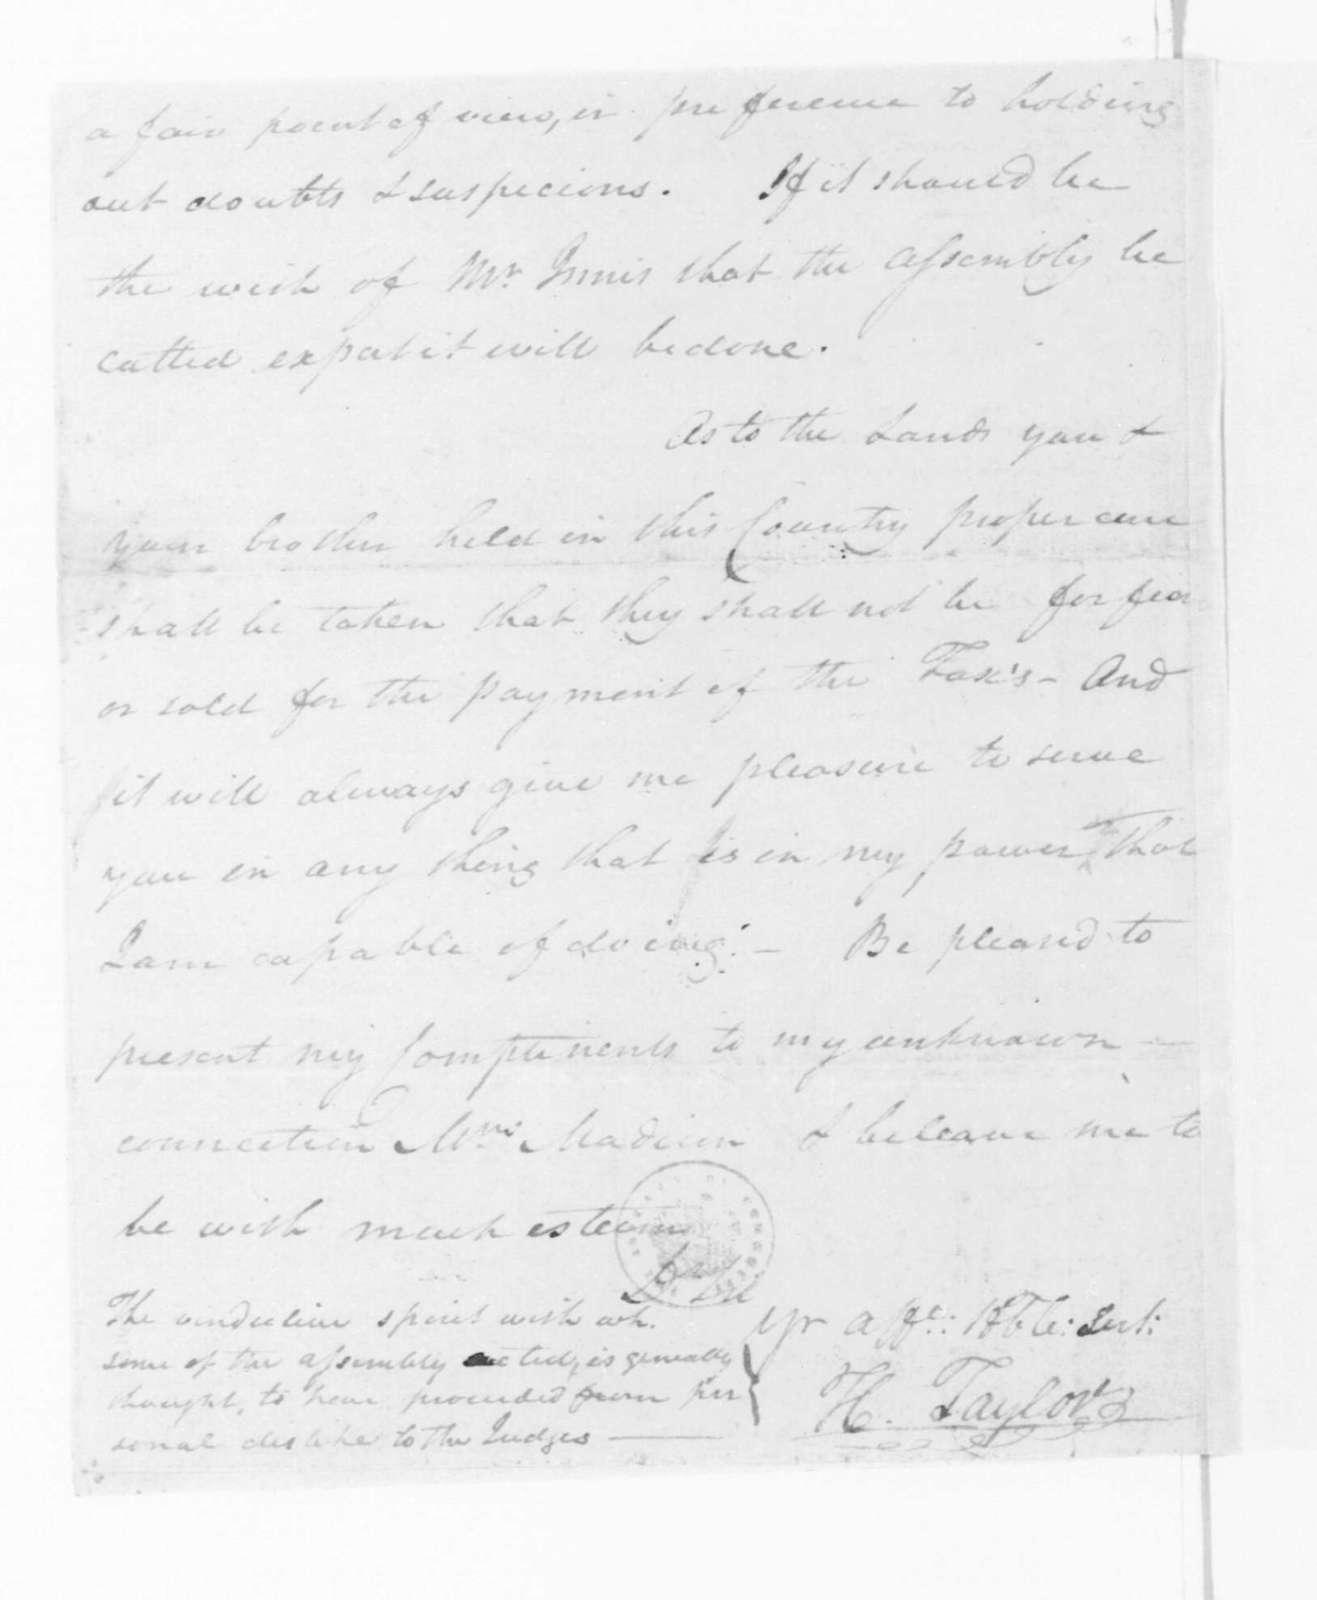 Hubbard Taylor to James Madison, February 3, 1795.